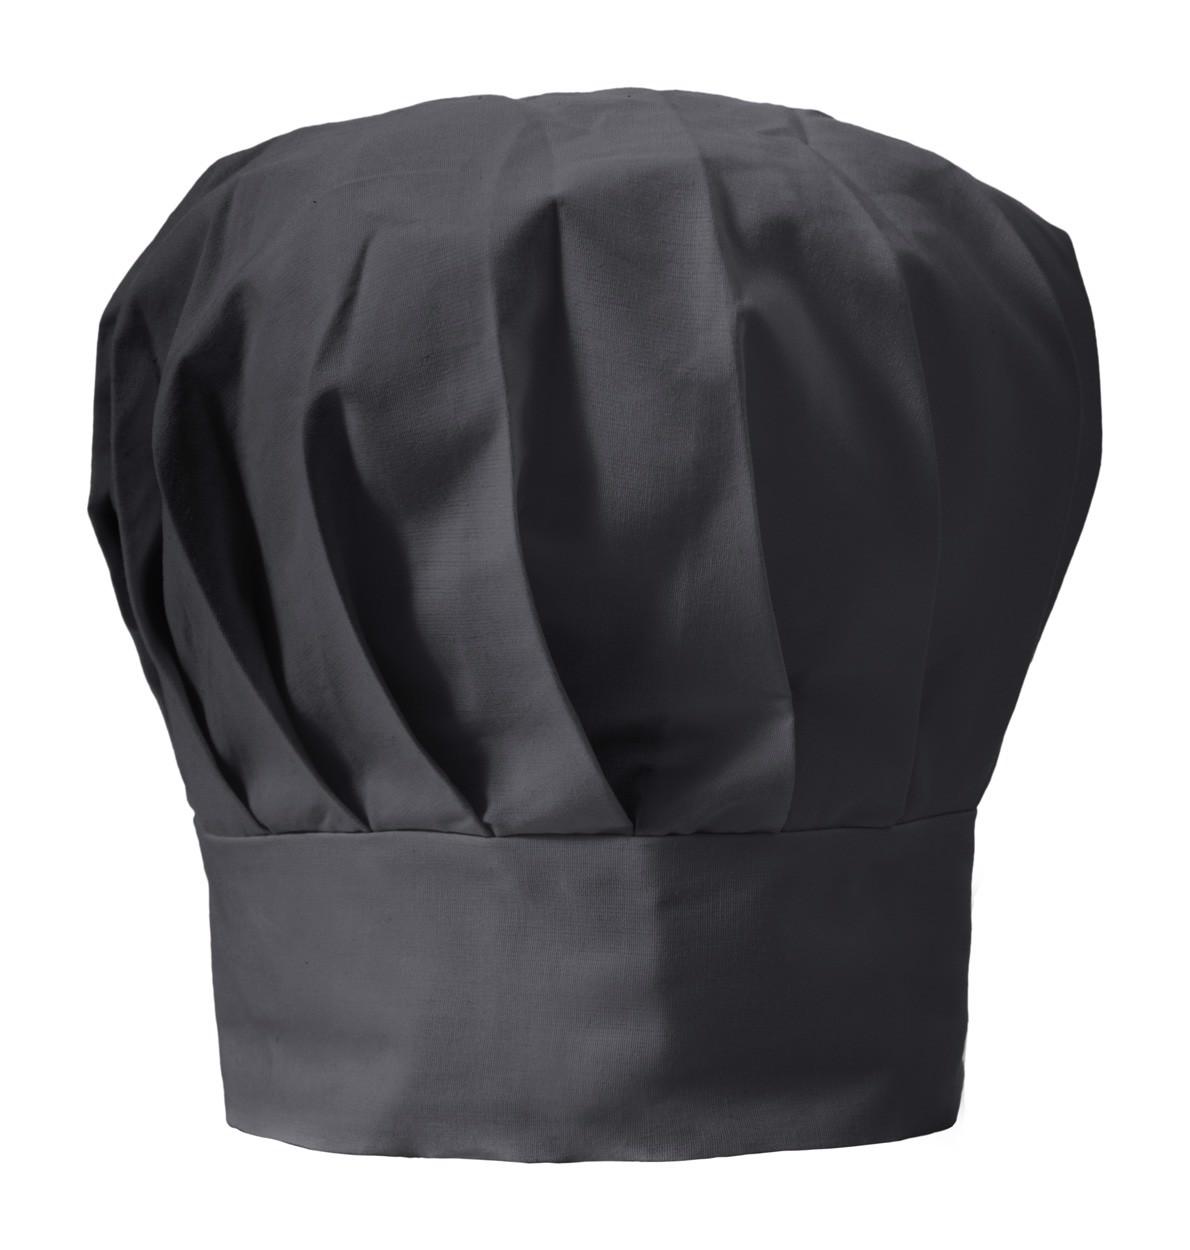 Bonetă Bucătar Nilson - Negru